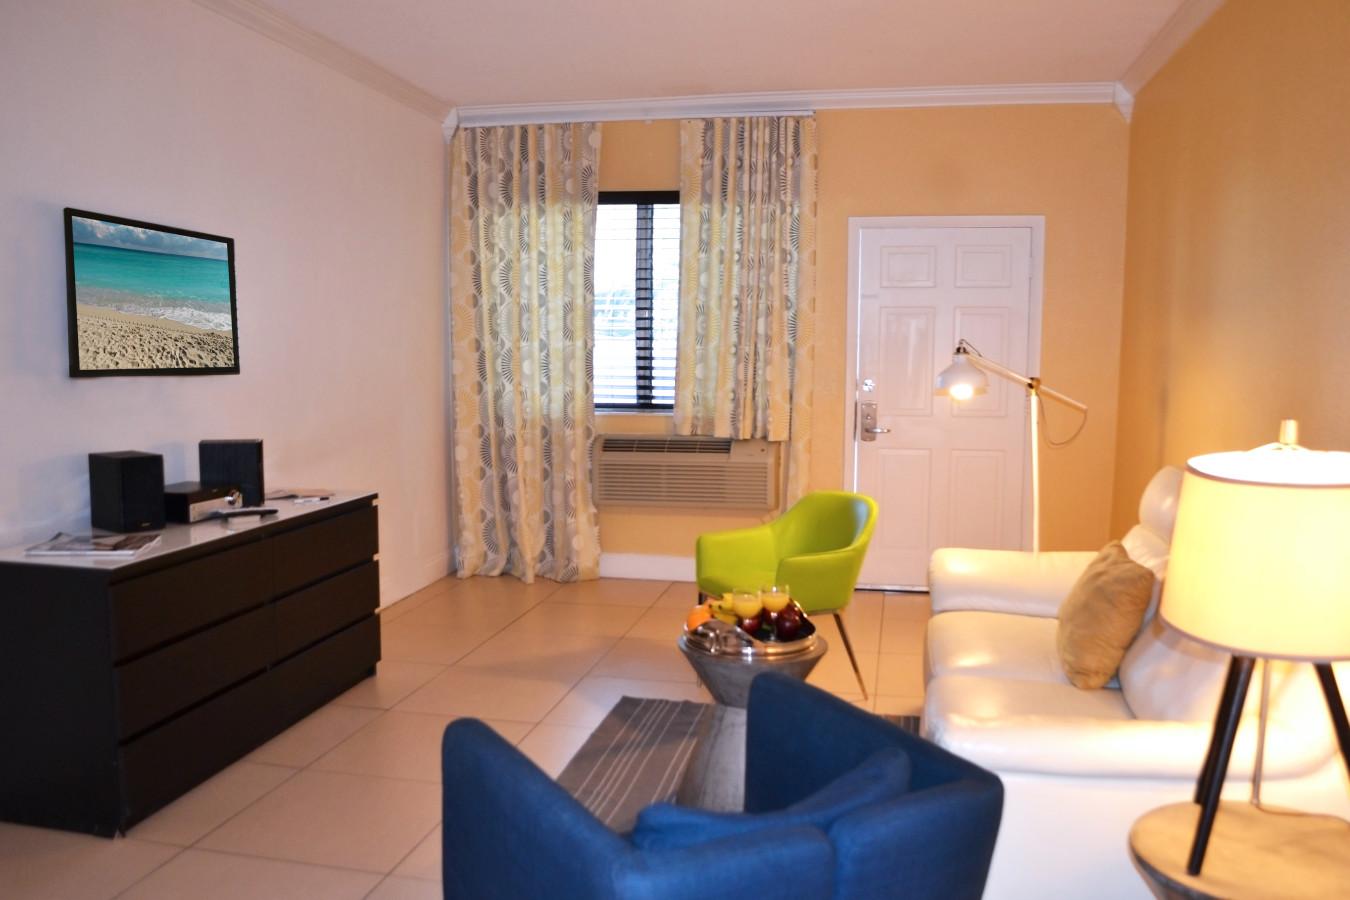 Beachside Apartment Hotel - Living Room Area